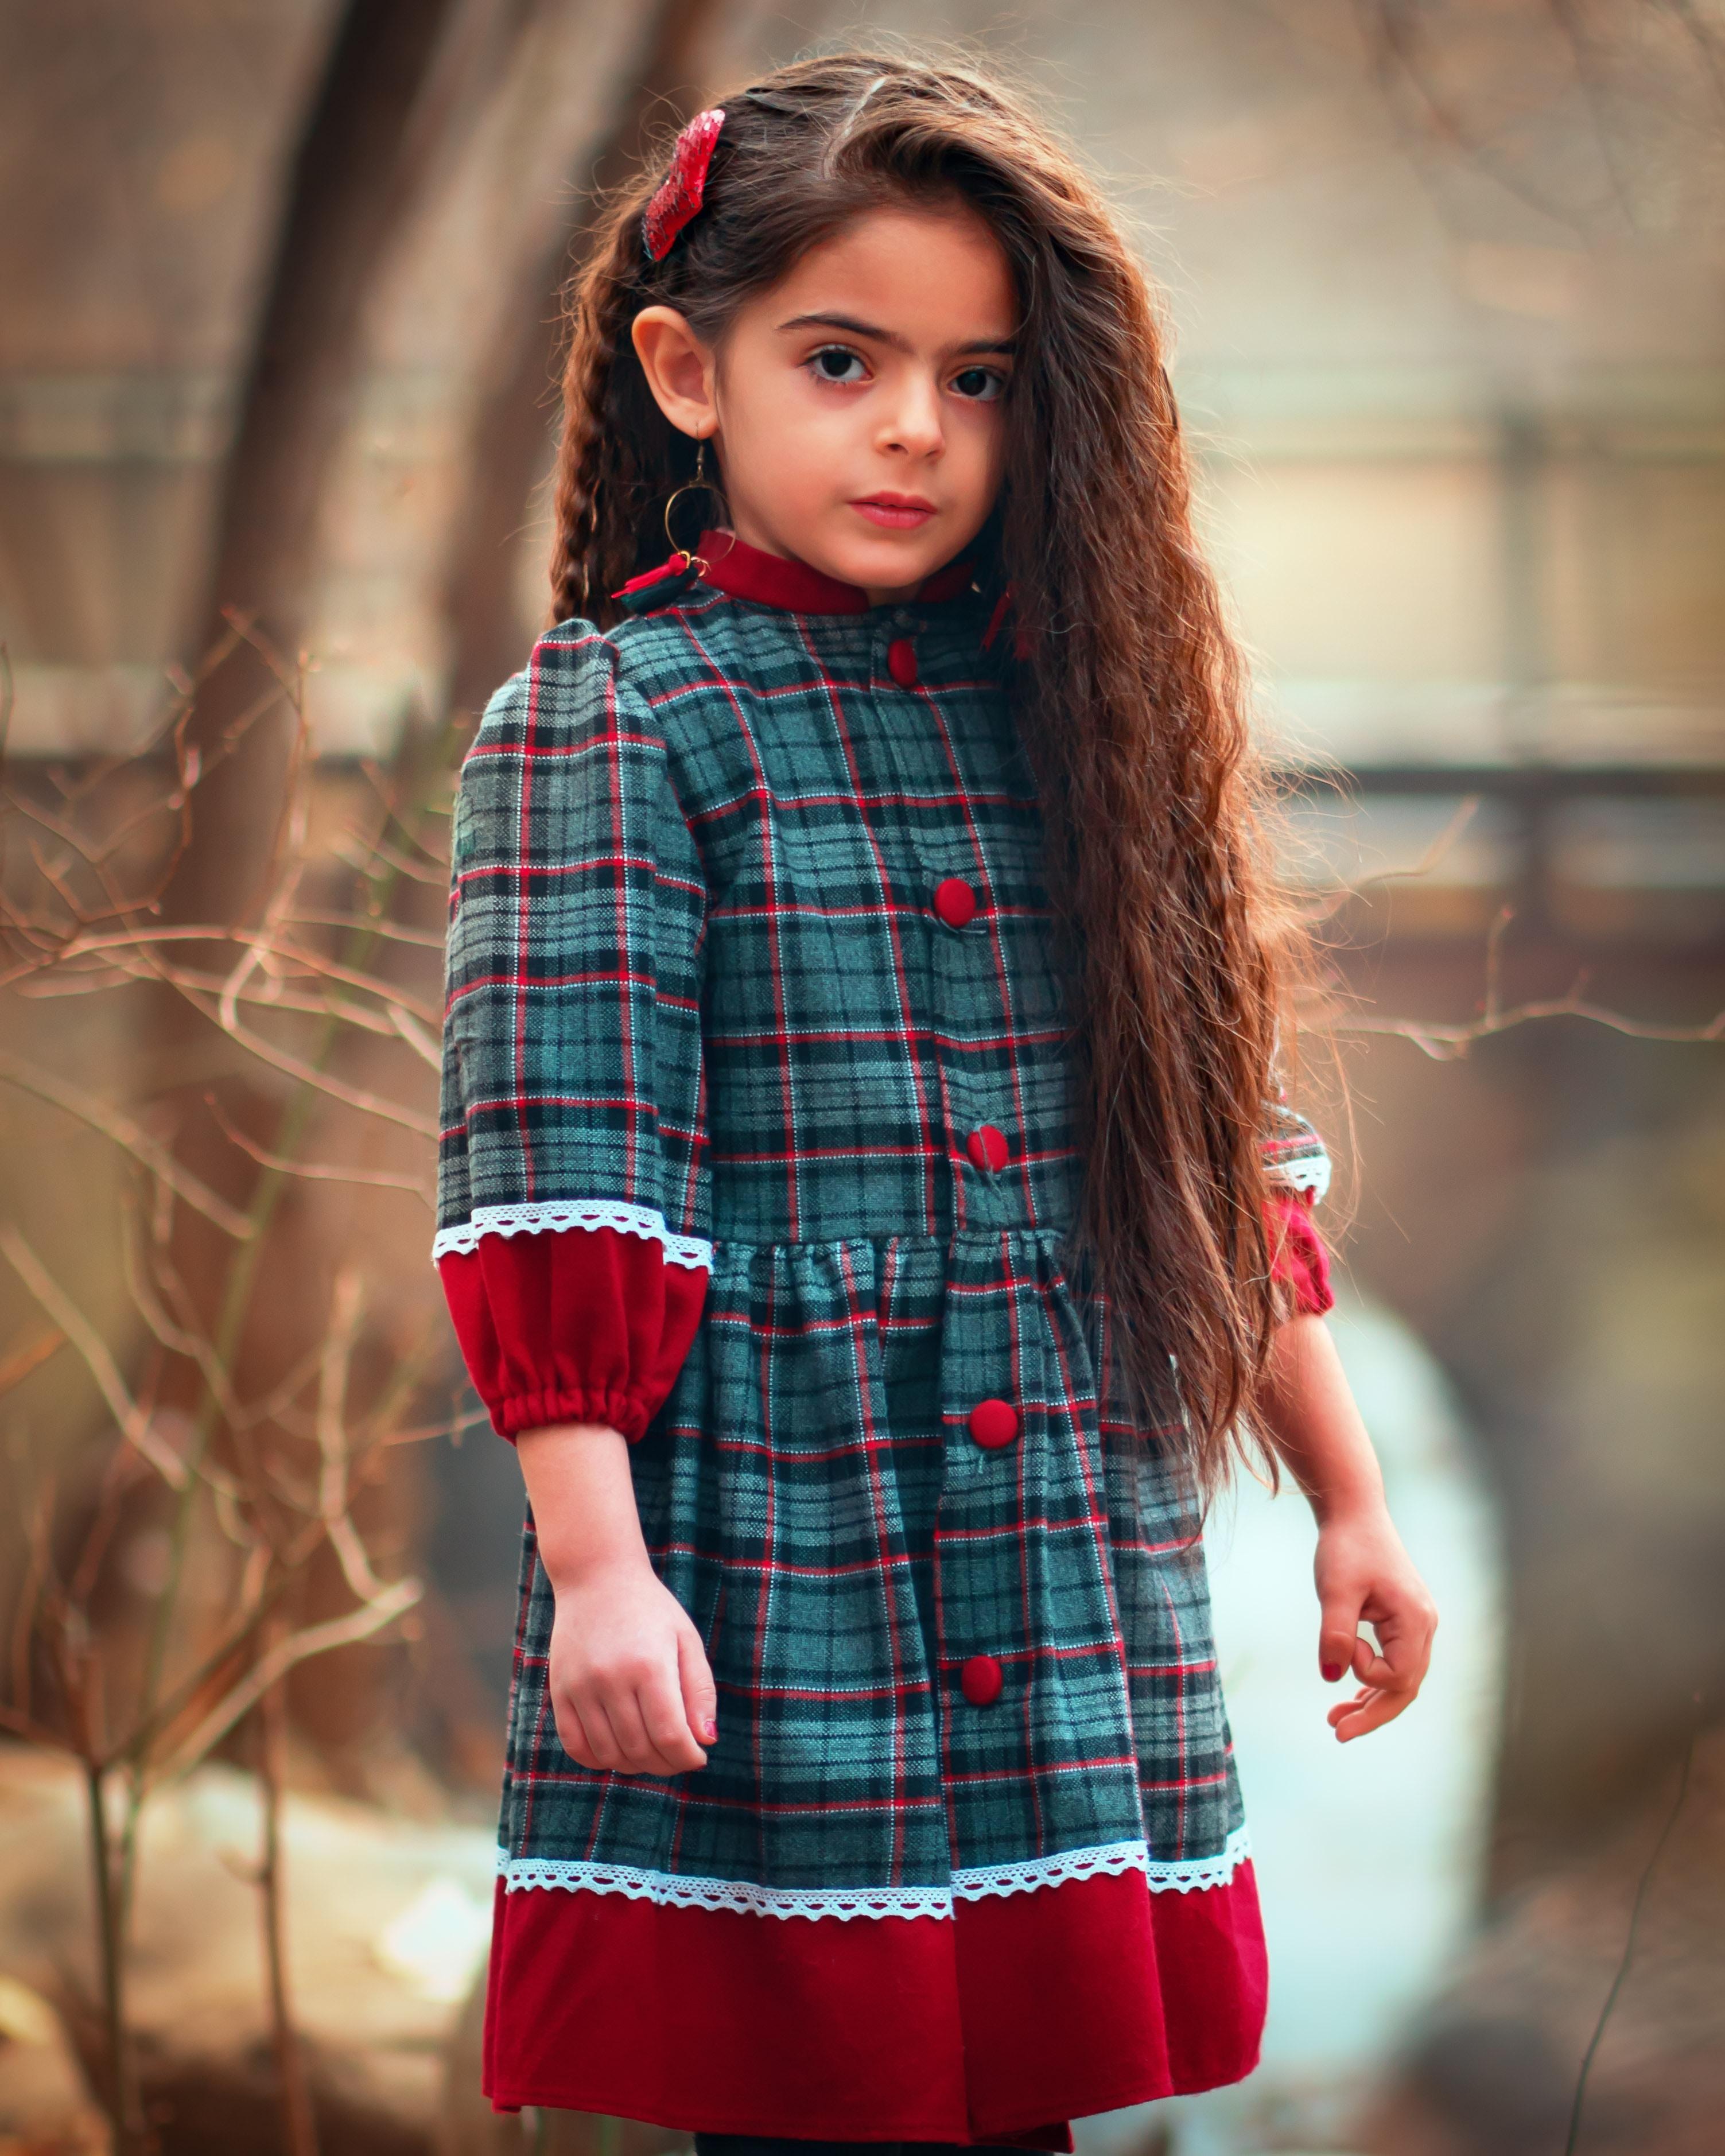 Image by Kayan Baby